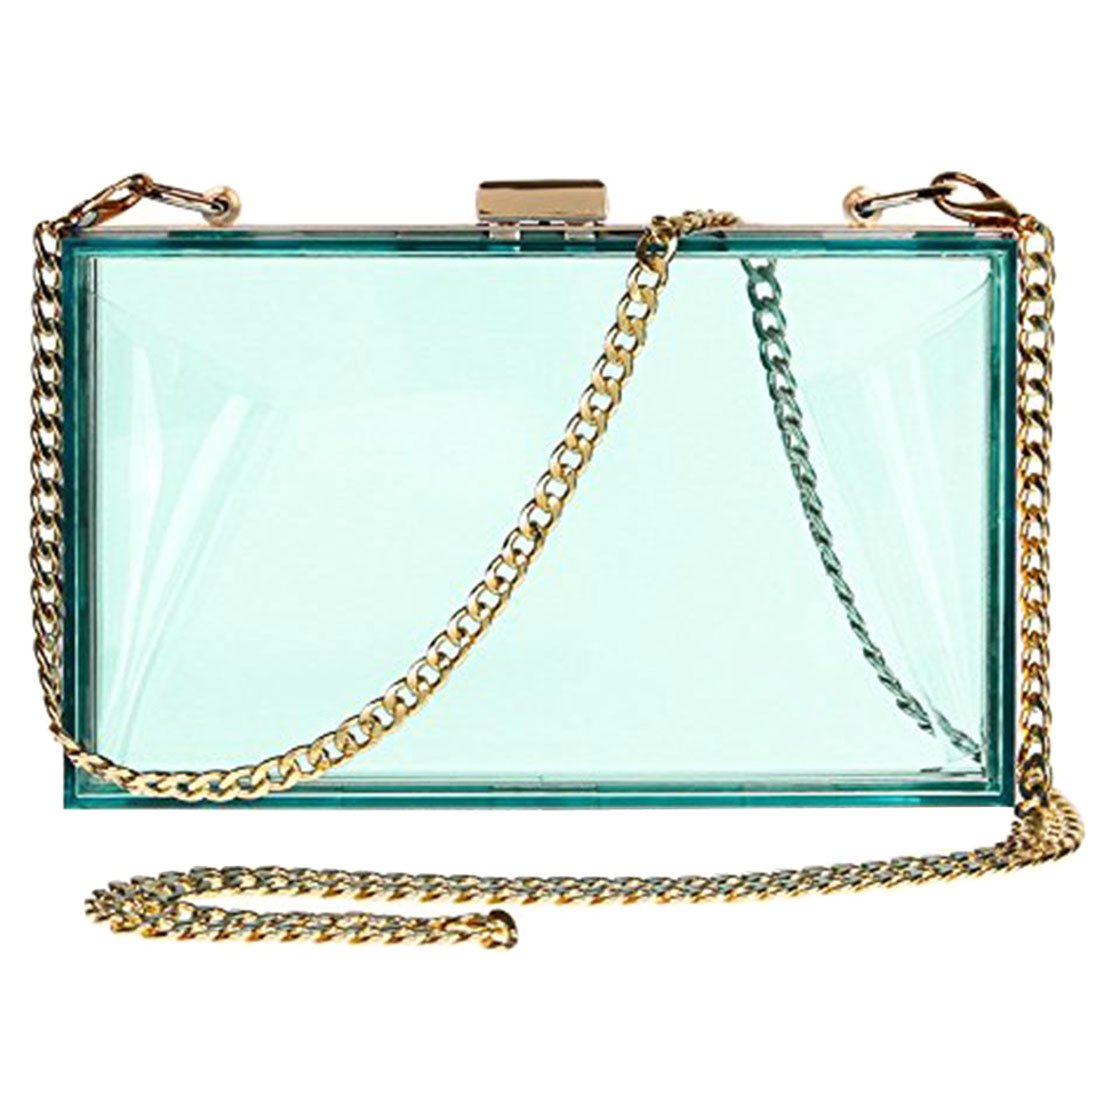 Women Cute Transparent Clear See Through Box Clutch Acrylic Evening Handbag Cross-Body Purse Bag (green)